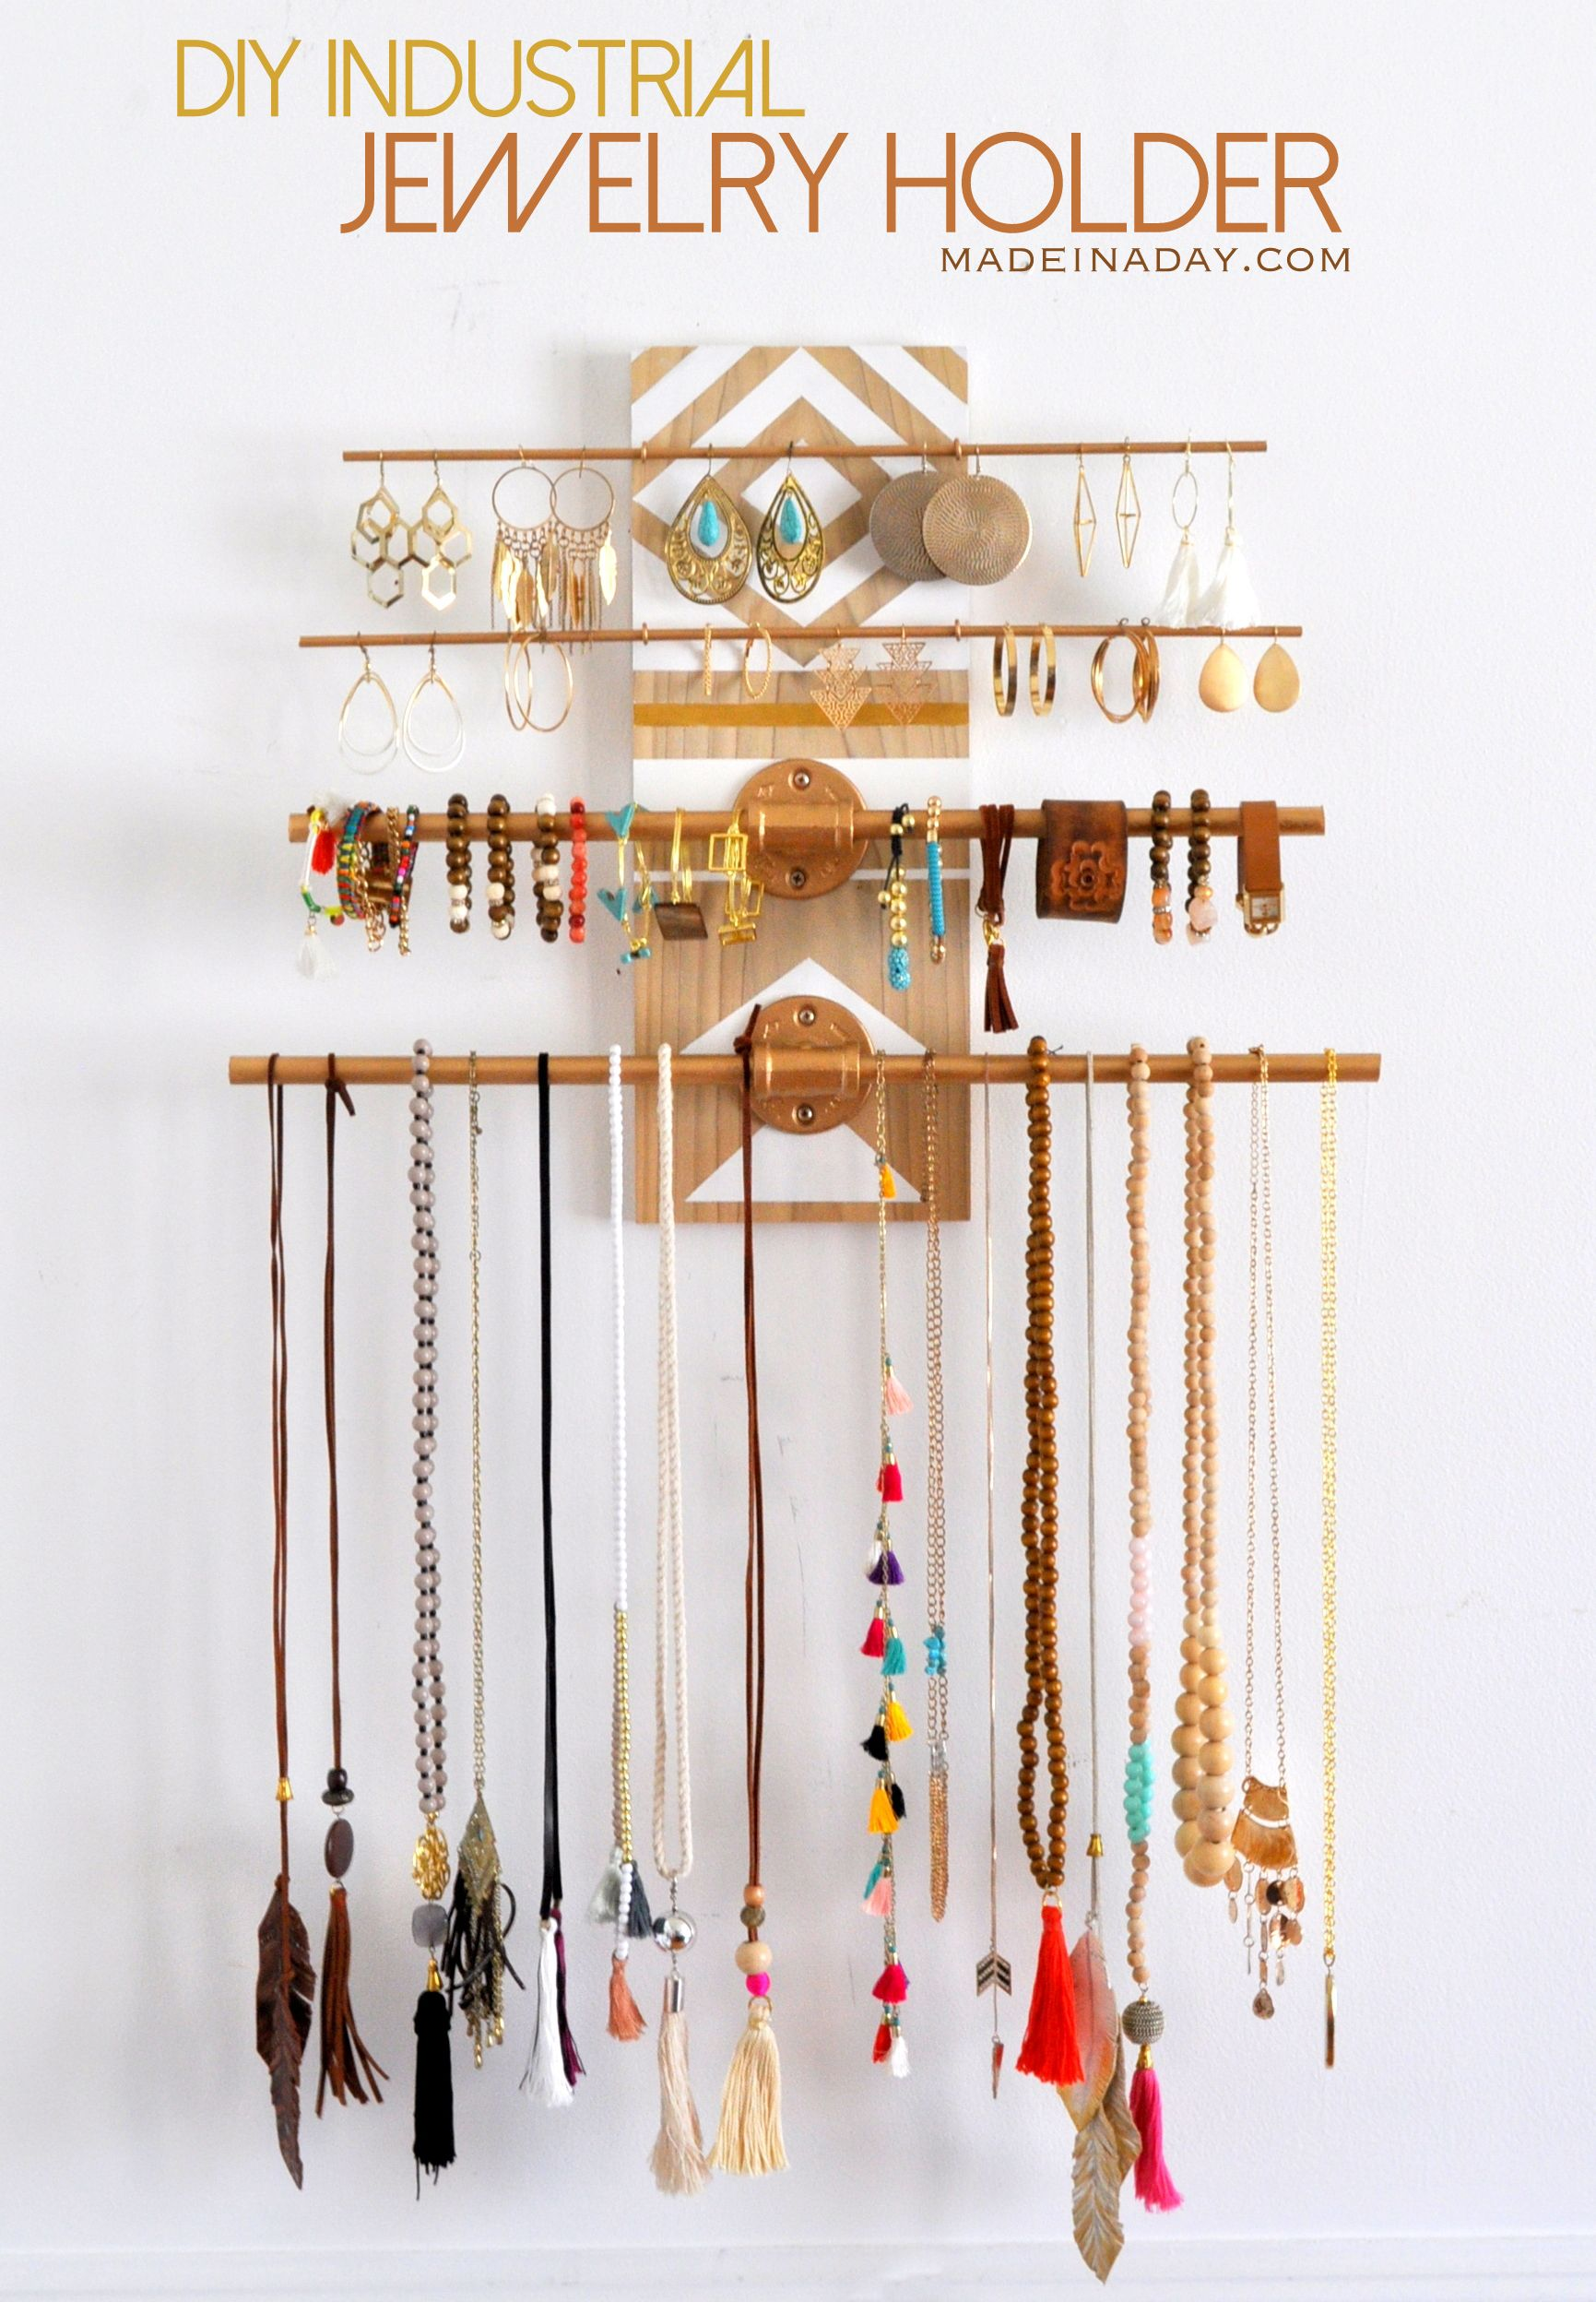 Diy Jewelry Holder Ideas Display Storage Organizer Pendants Wire Beads Choker Bohe Wall Mount Jewelry Organizer Diy Jewelry Holder Jewelry Organization